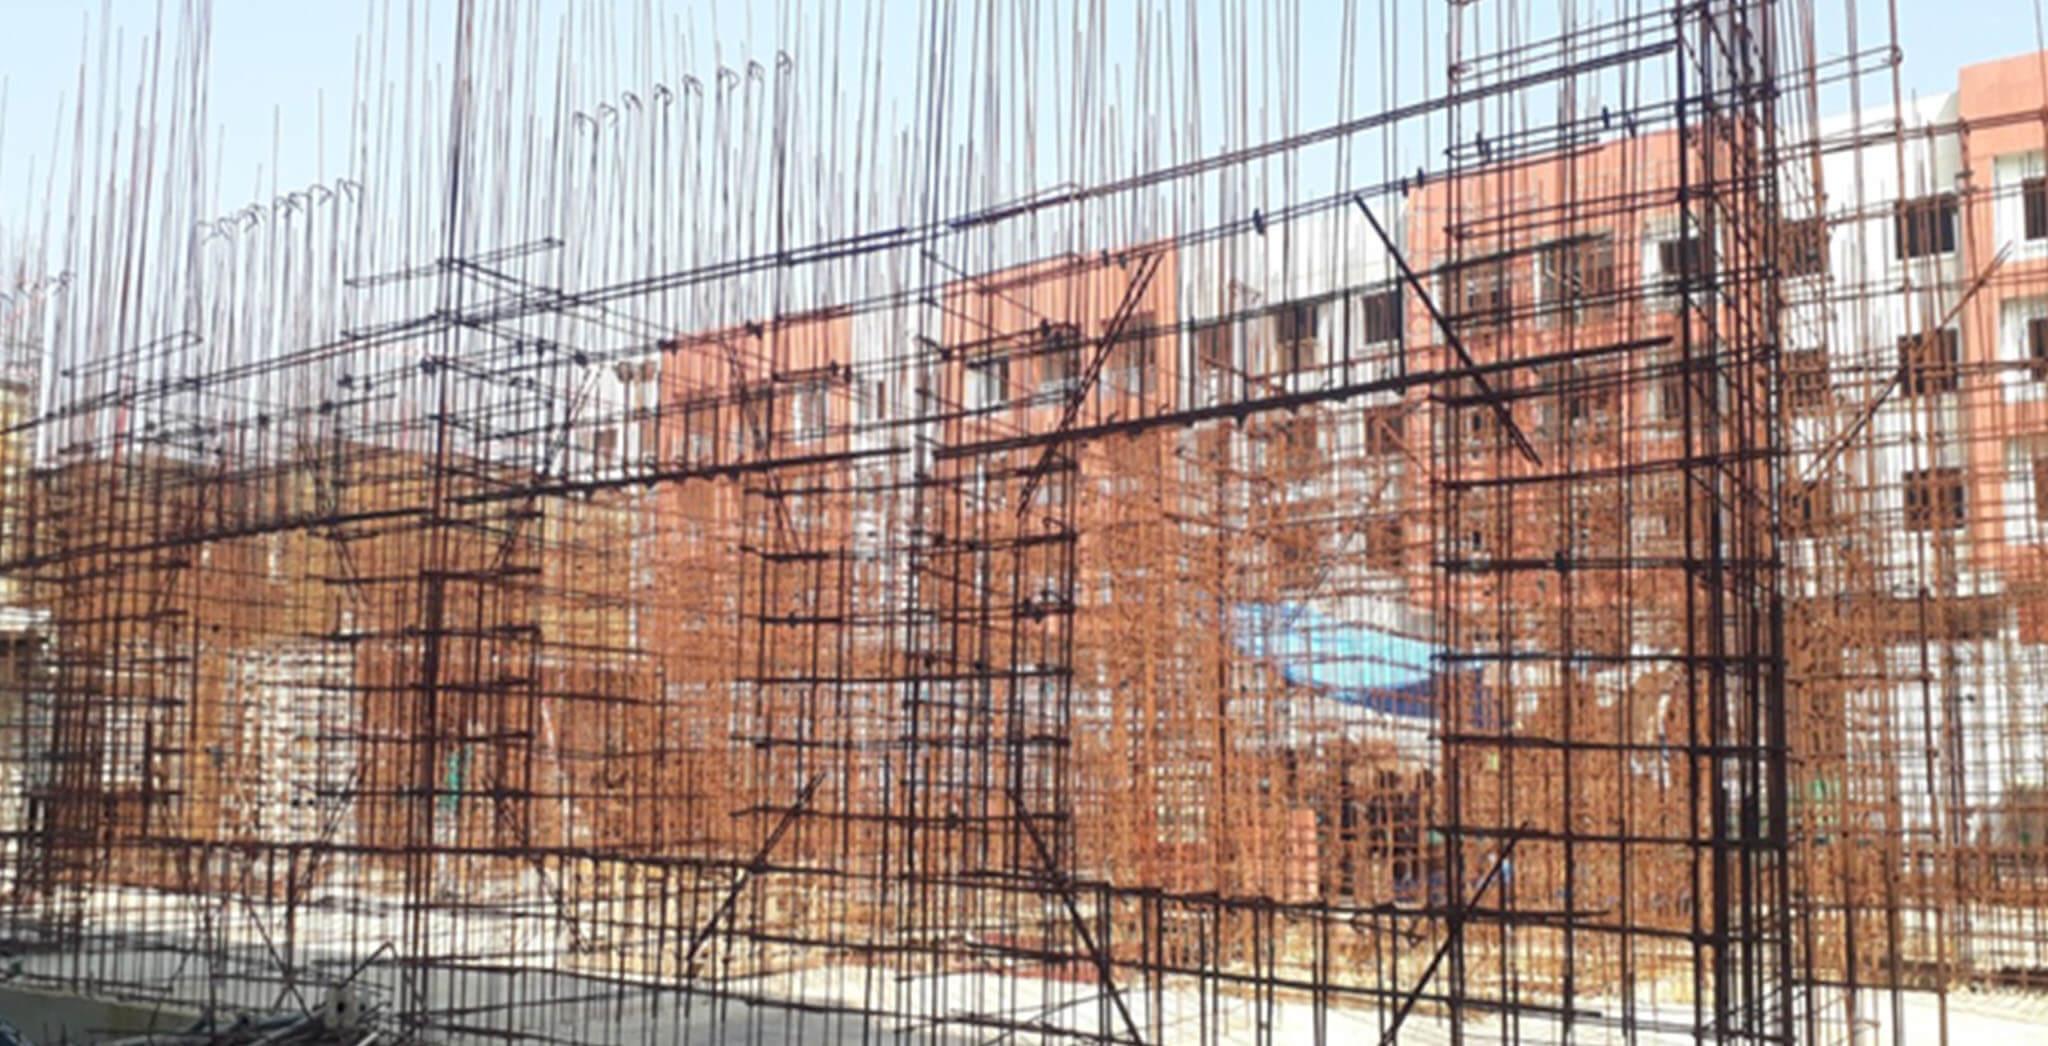 Feb 2021 - J Block: First floor slab work-in-progress